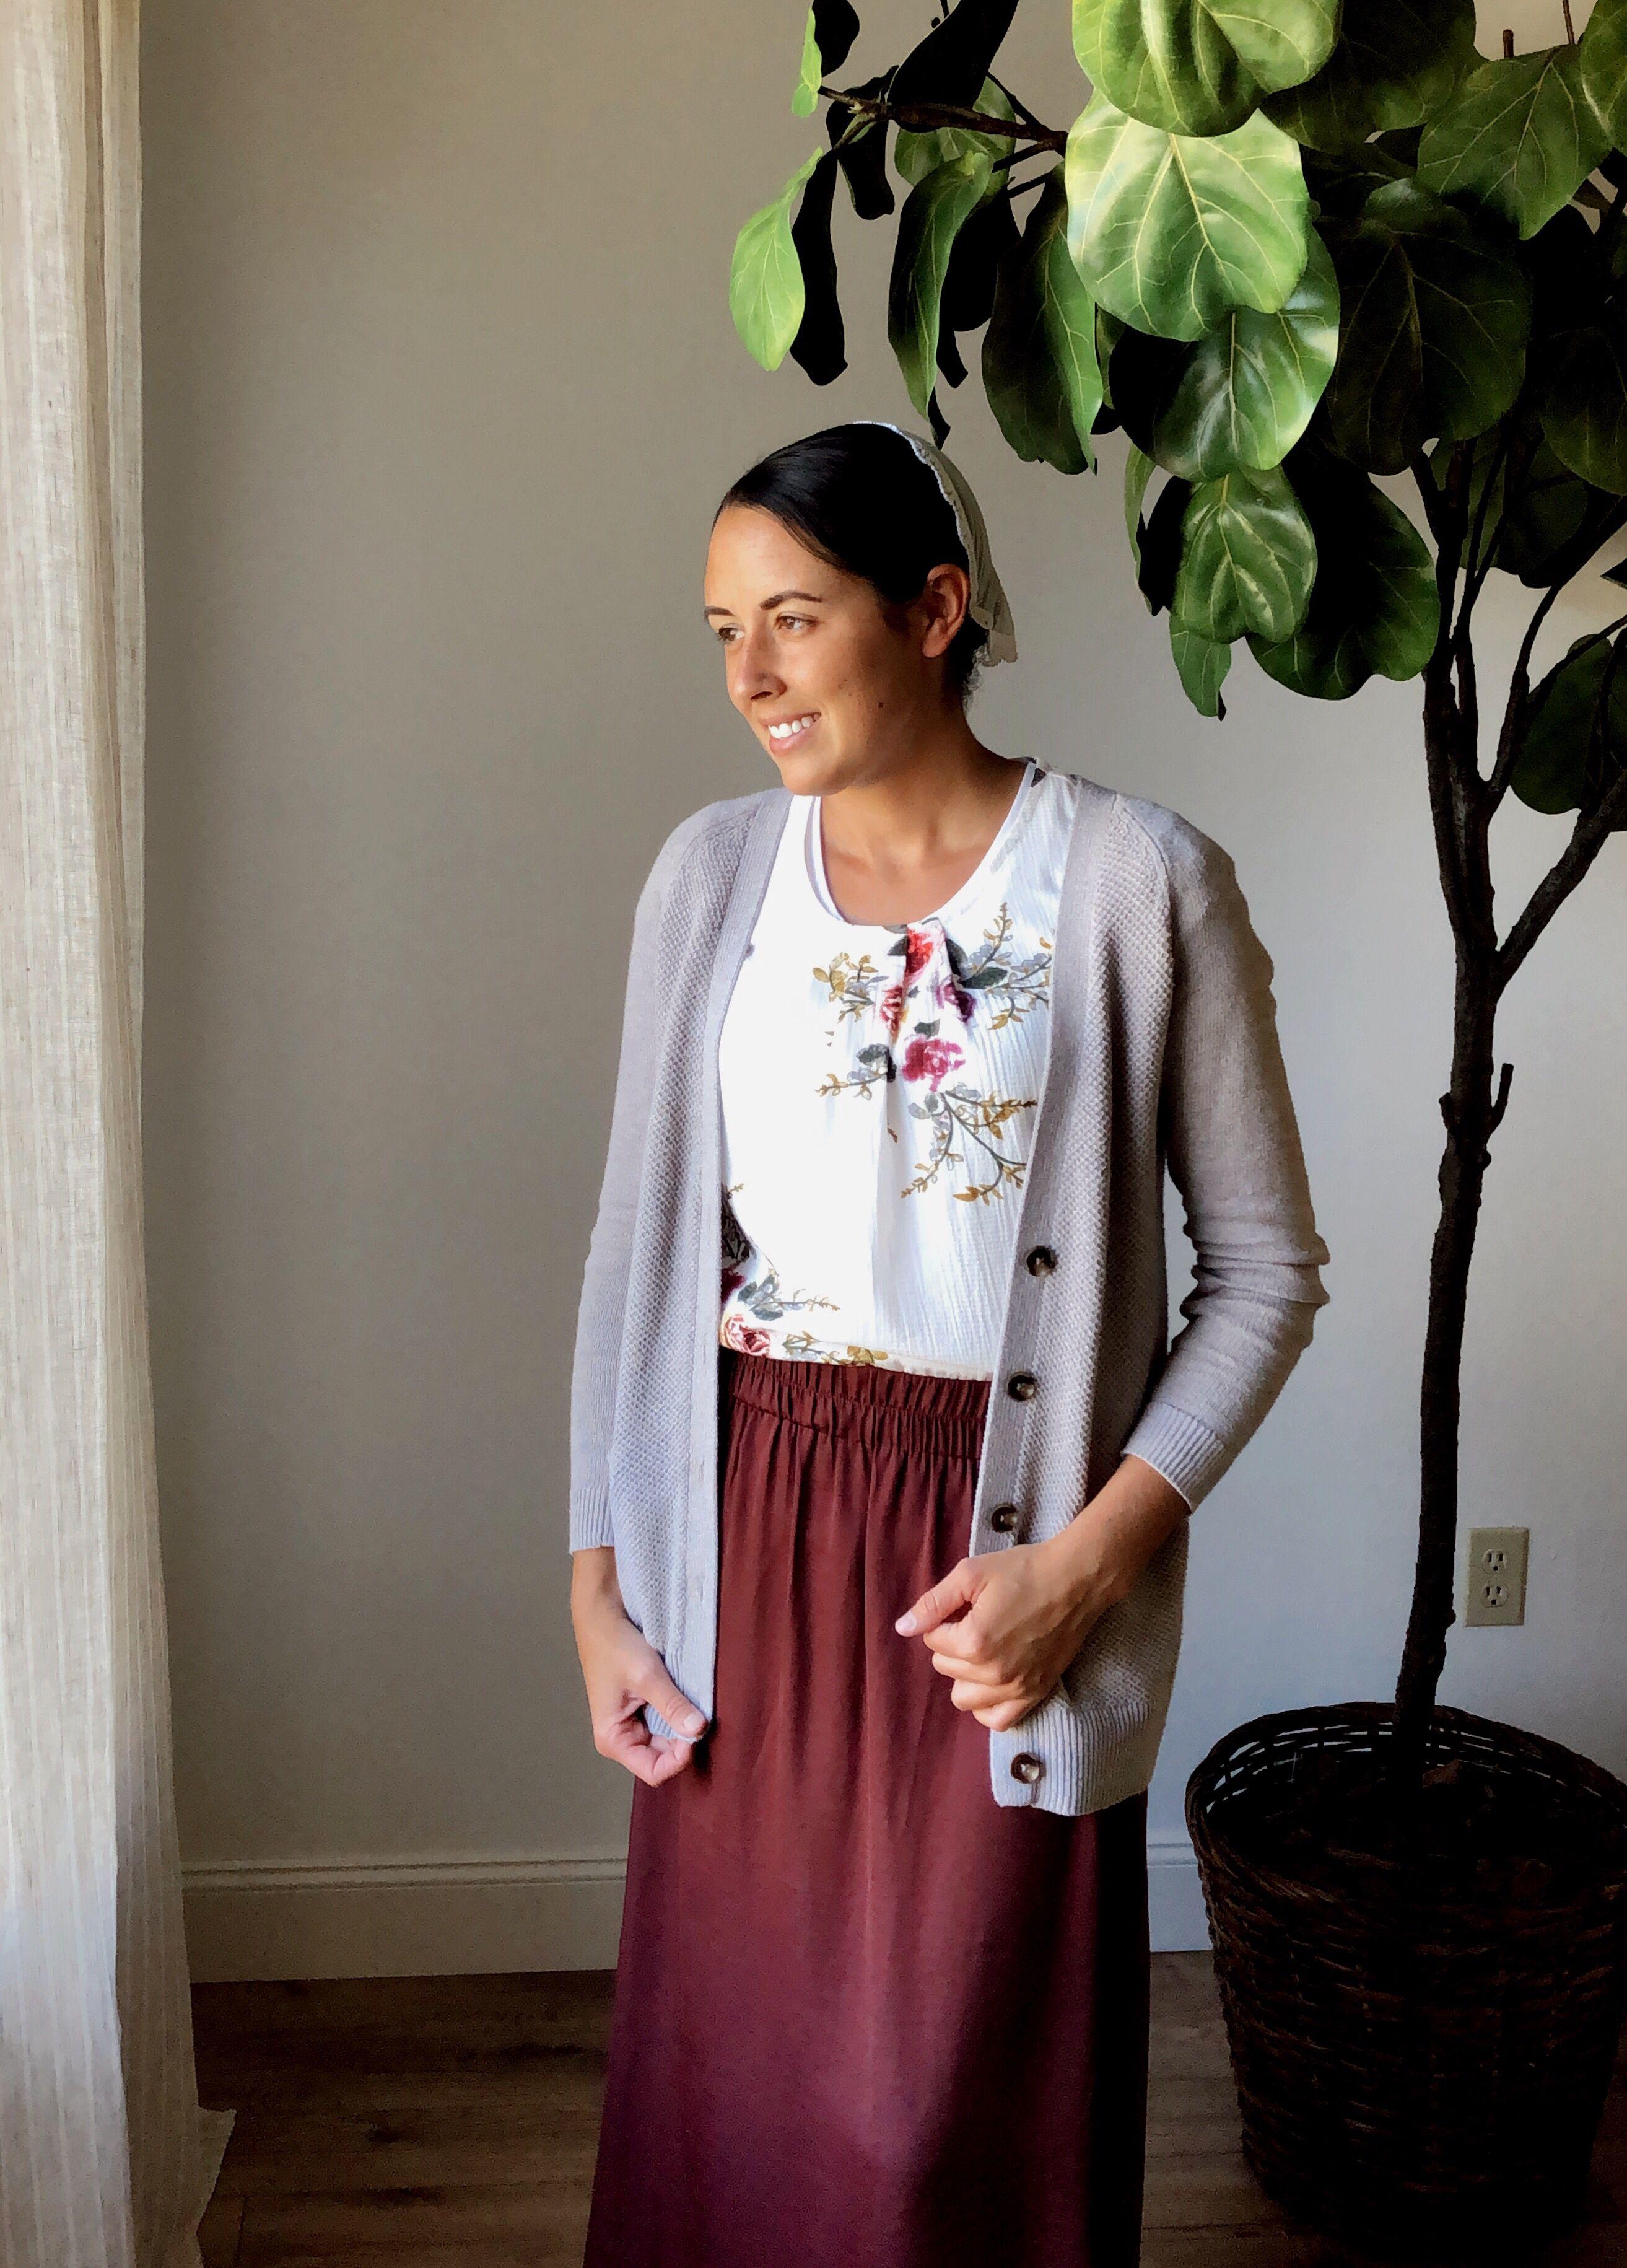 modestskirts #modestfashion   Modest Clothing ➕ Accessories in 2019